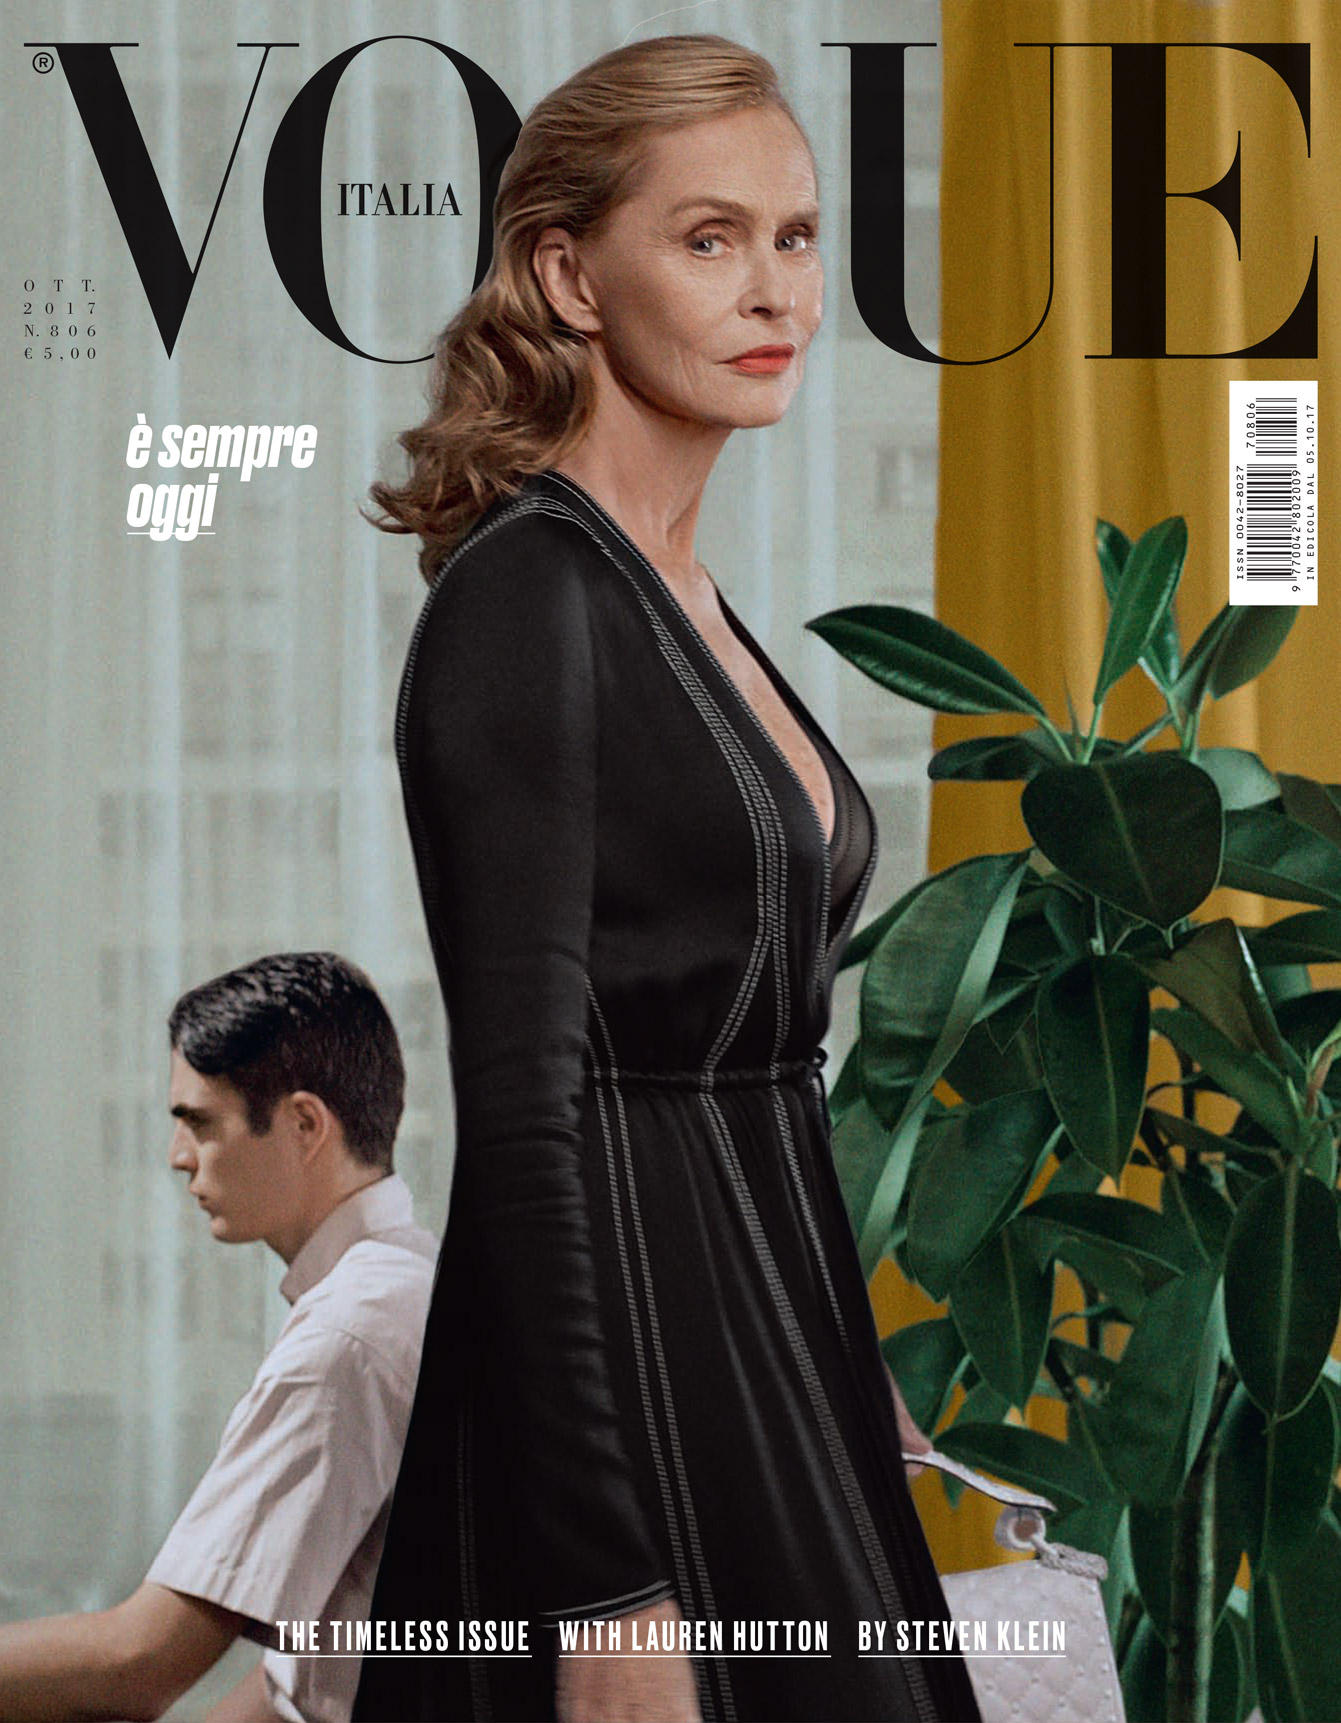 2017_10_Italia_Vogue_Steven_Klein_Cover_1.jpg